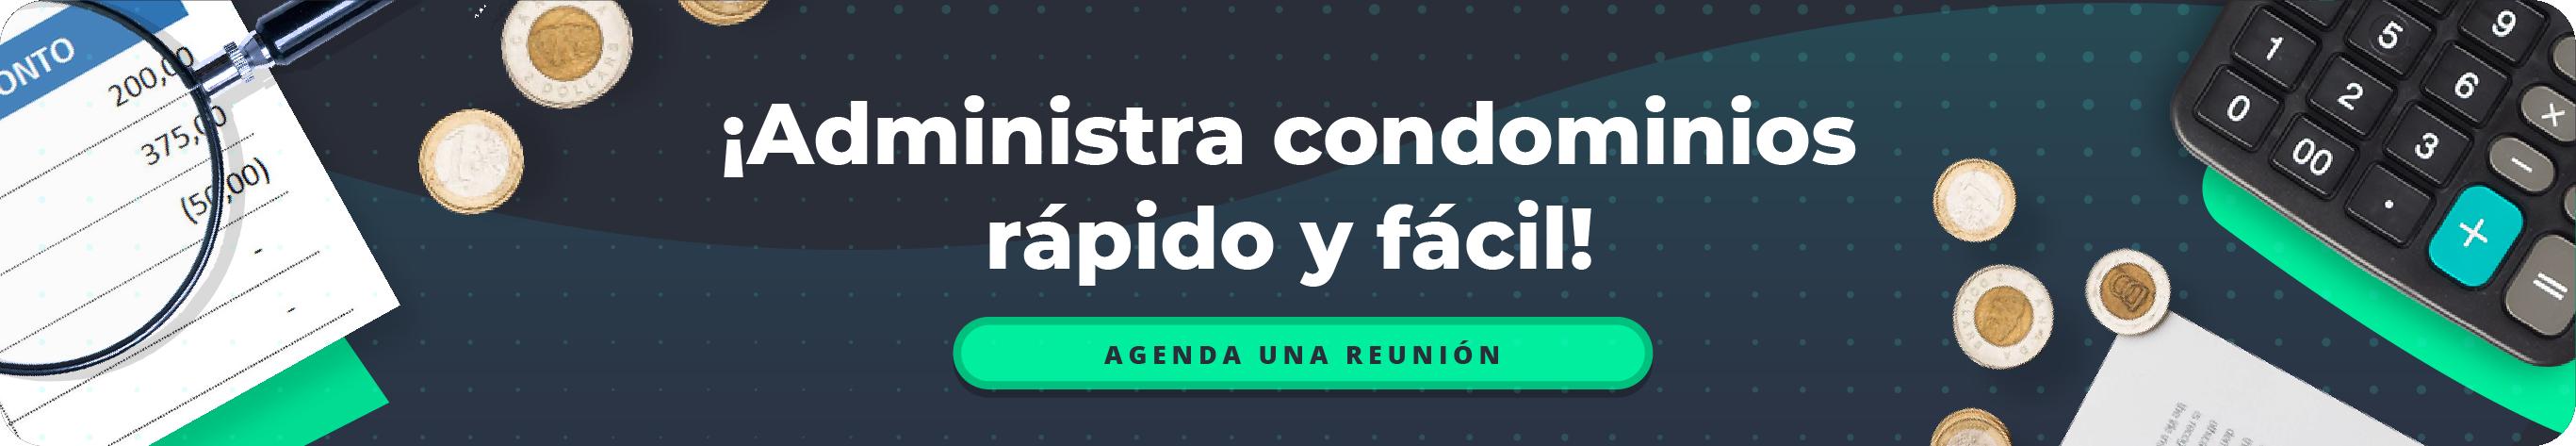 Administra condominios con ComunidadFeliz.mx